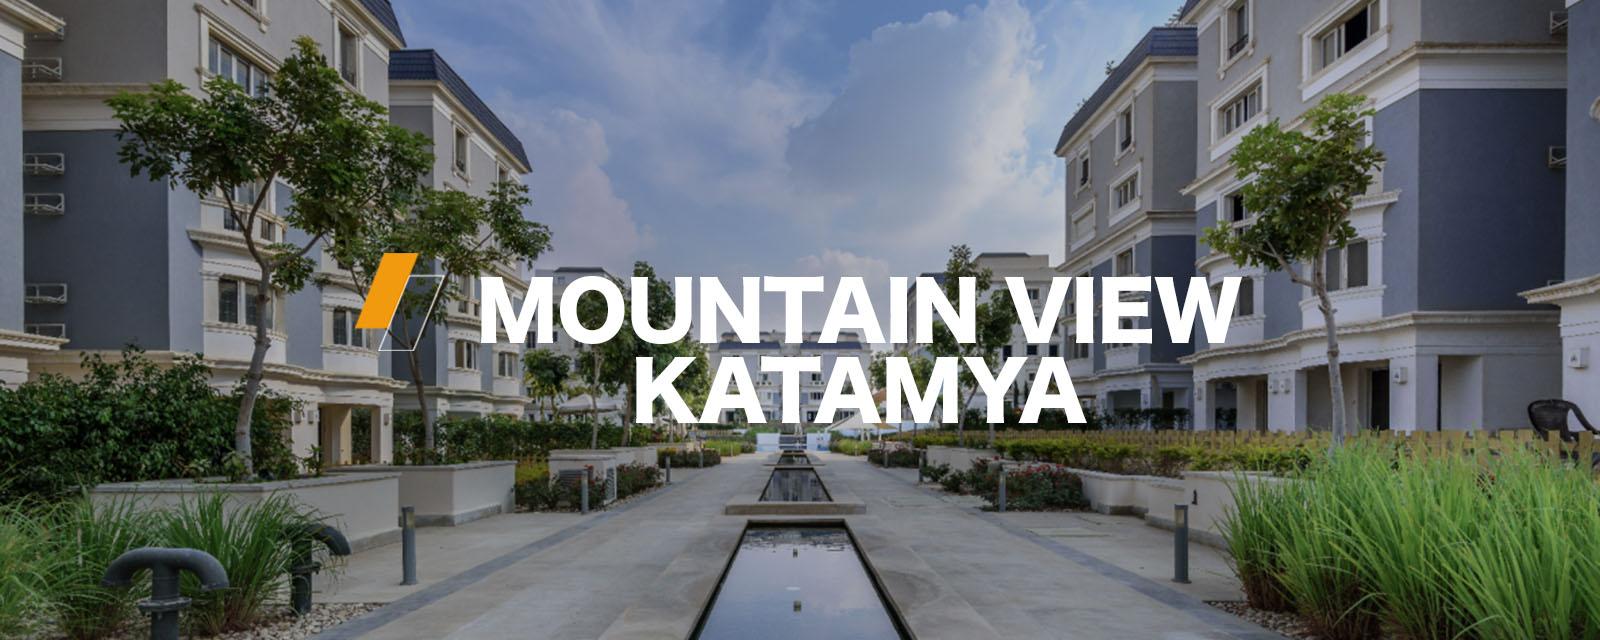 Mountain View Executive Residence Katameya by Mountain View-featured-1